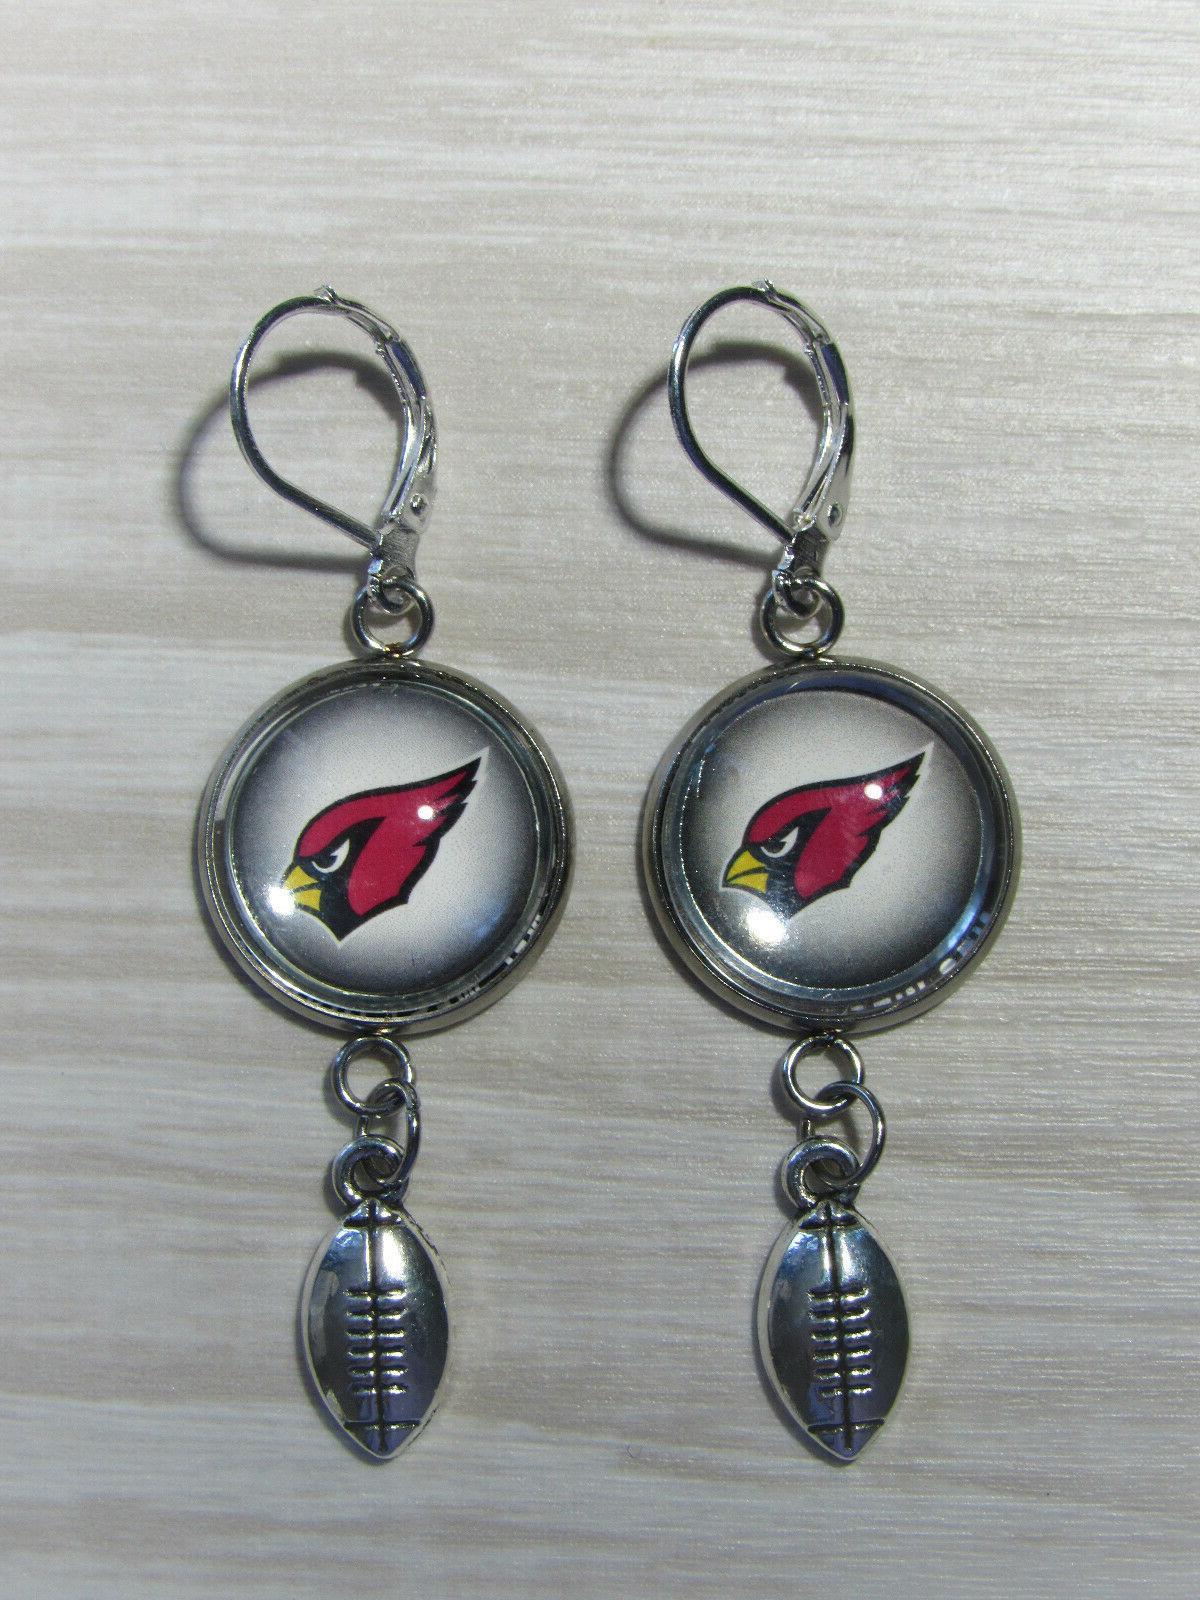 arizona cardinals earrings w football charm upcycled